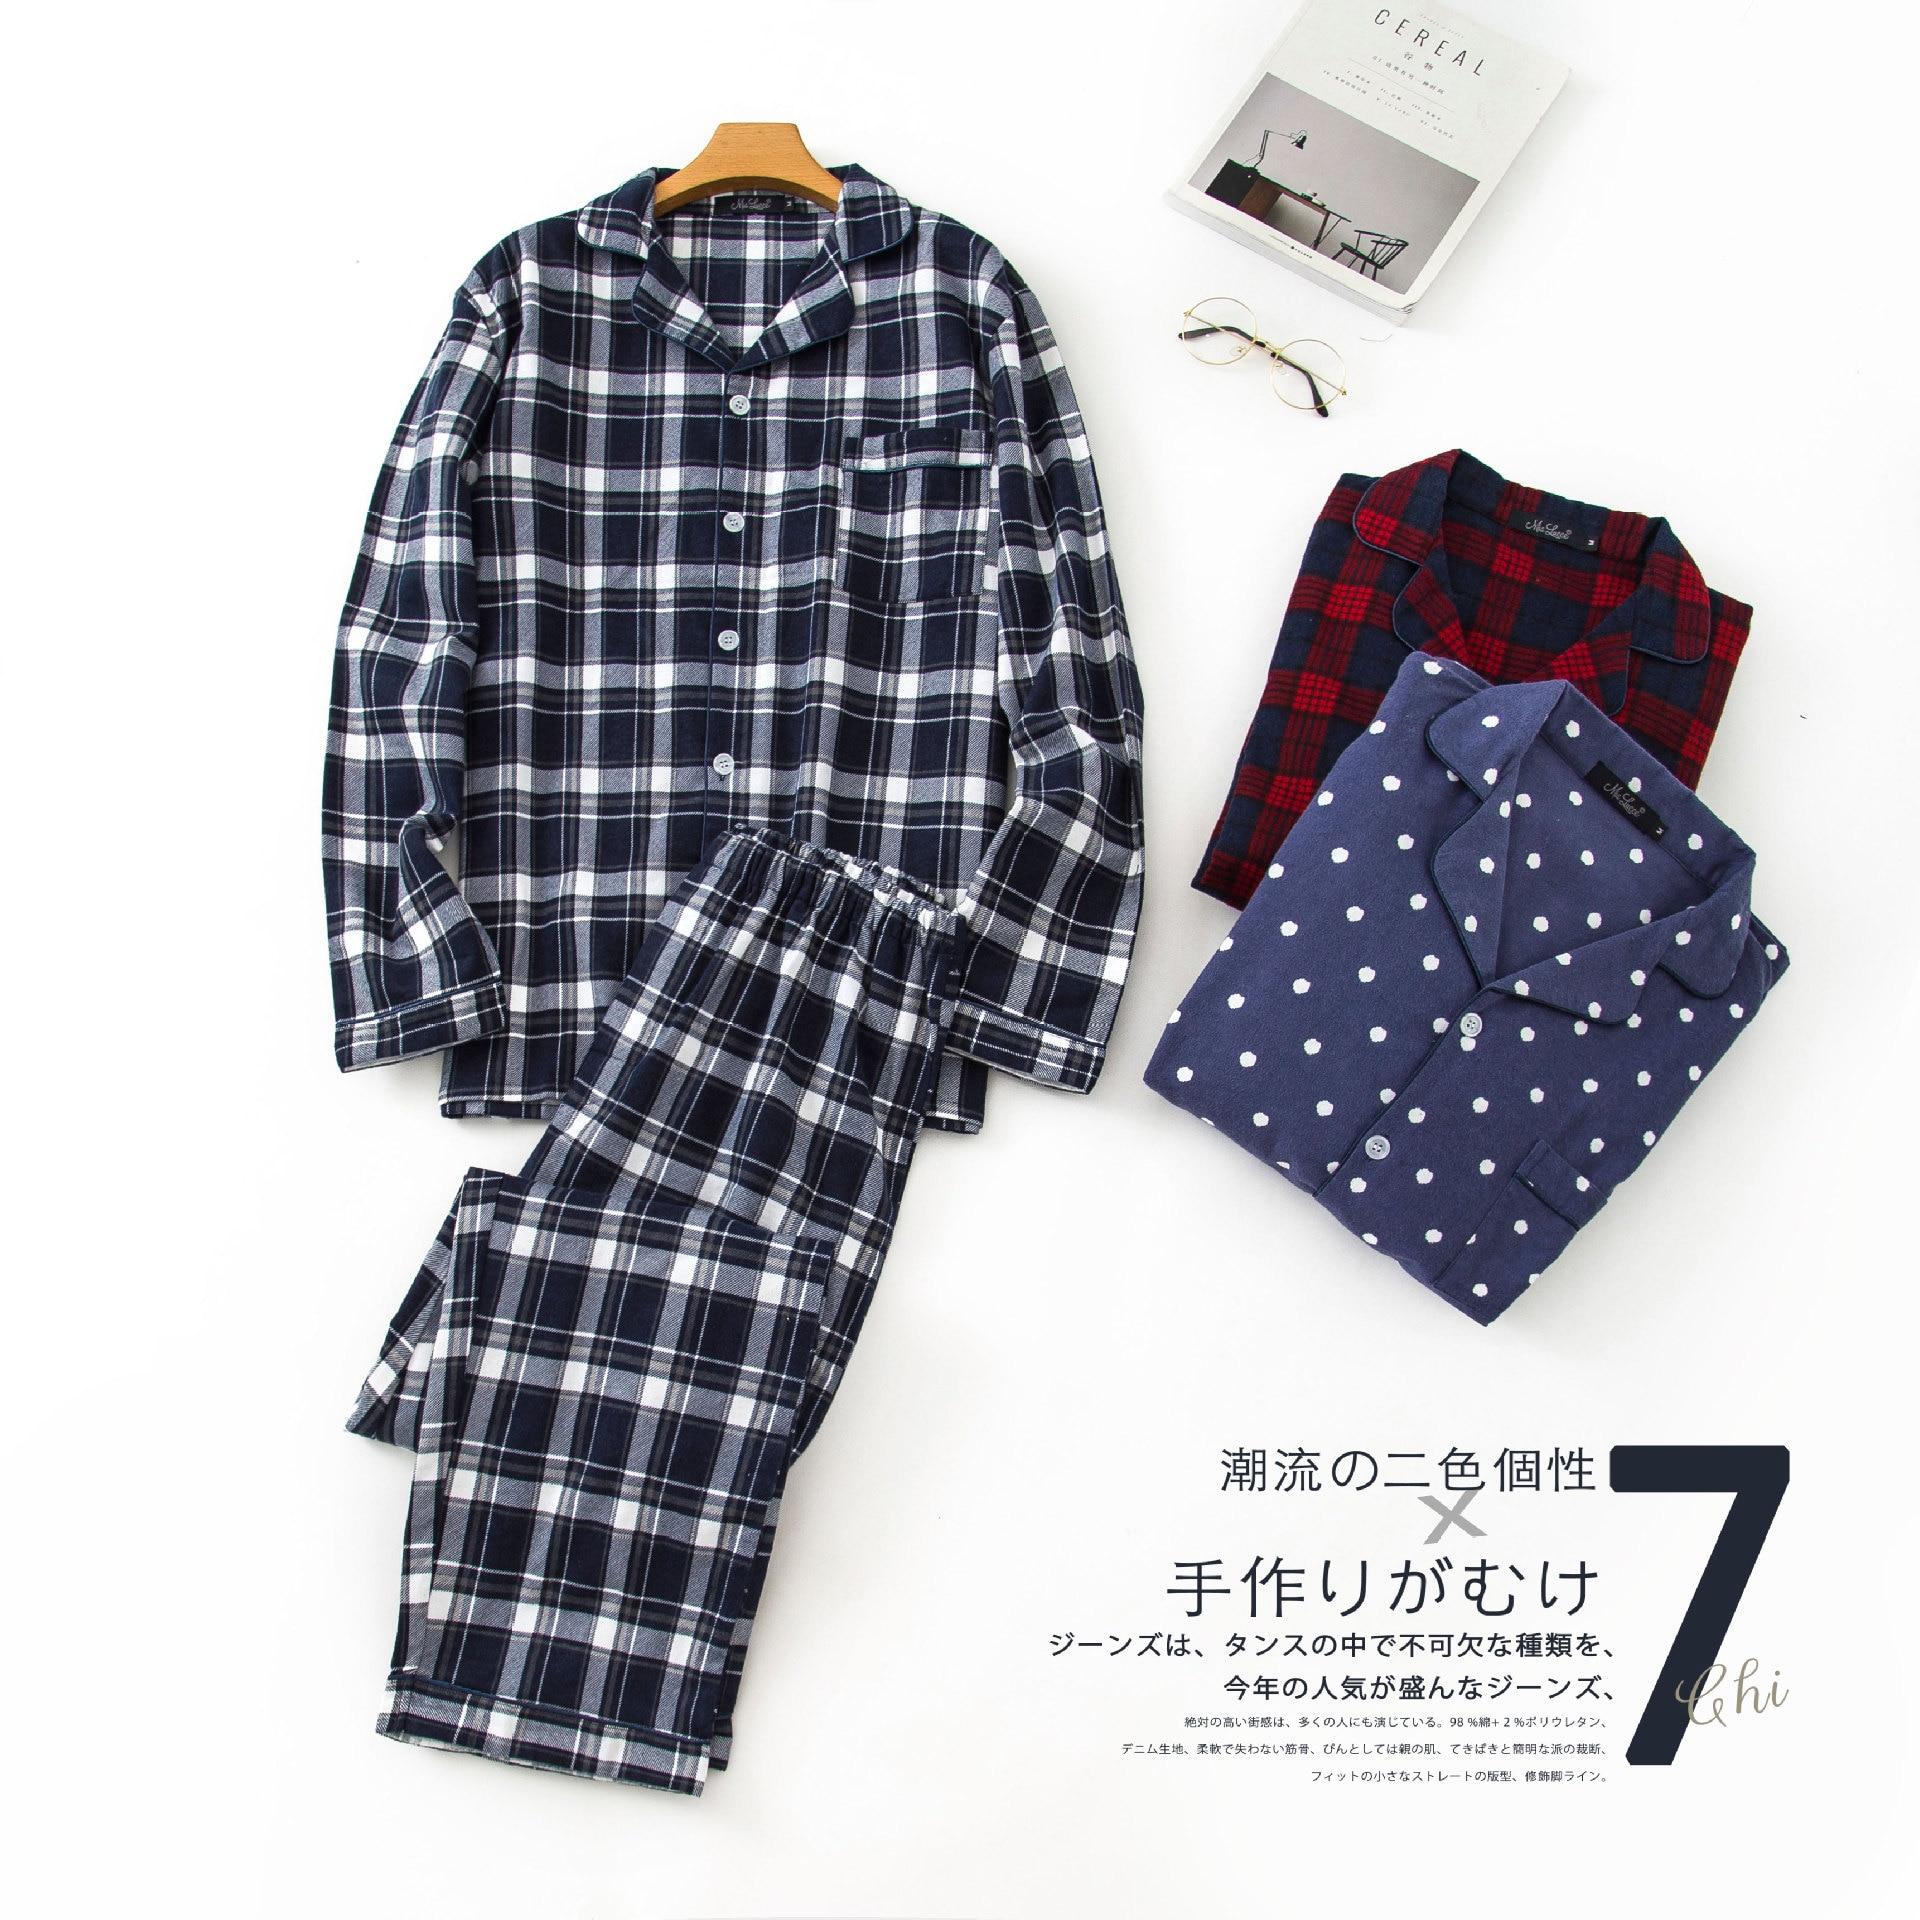 New Cotton Pajamas-Sets Men Autumn Long-sleeved Trousers Pijama Suits Blue Plaid Sleepwear Winter Soft Velvet Clothing